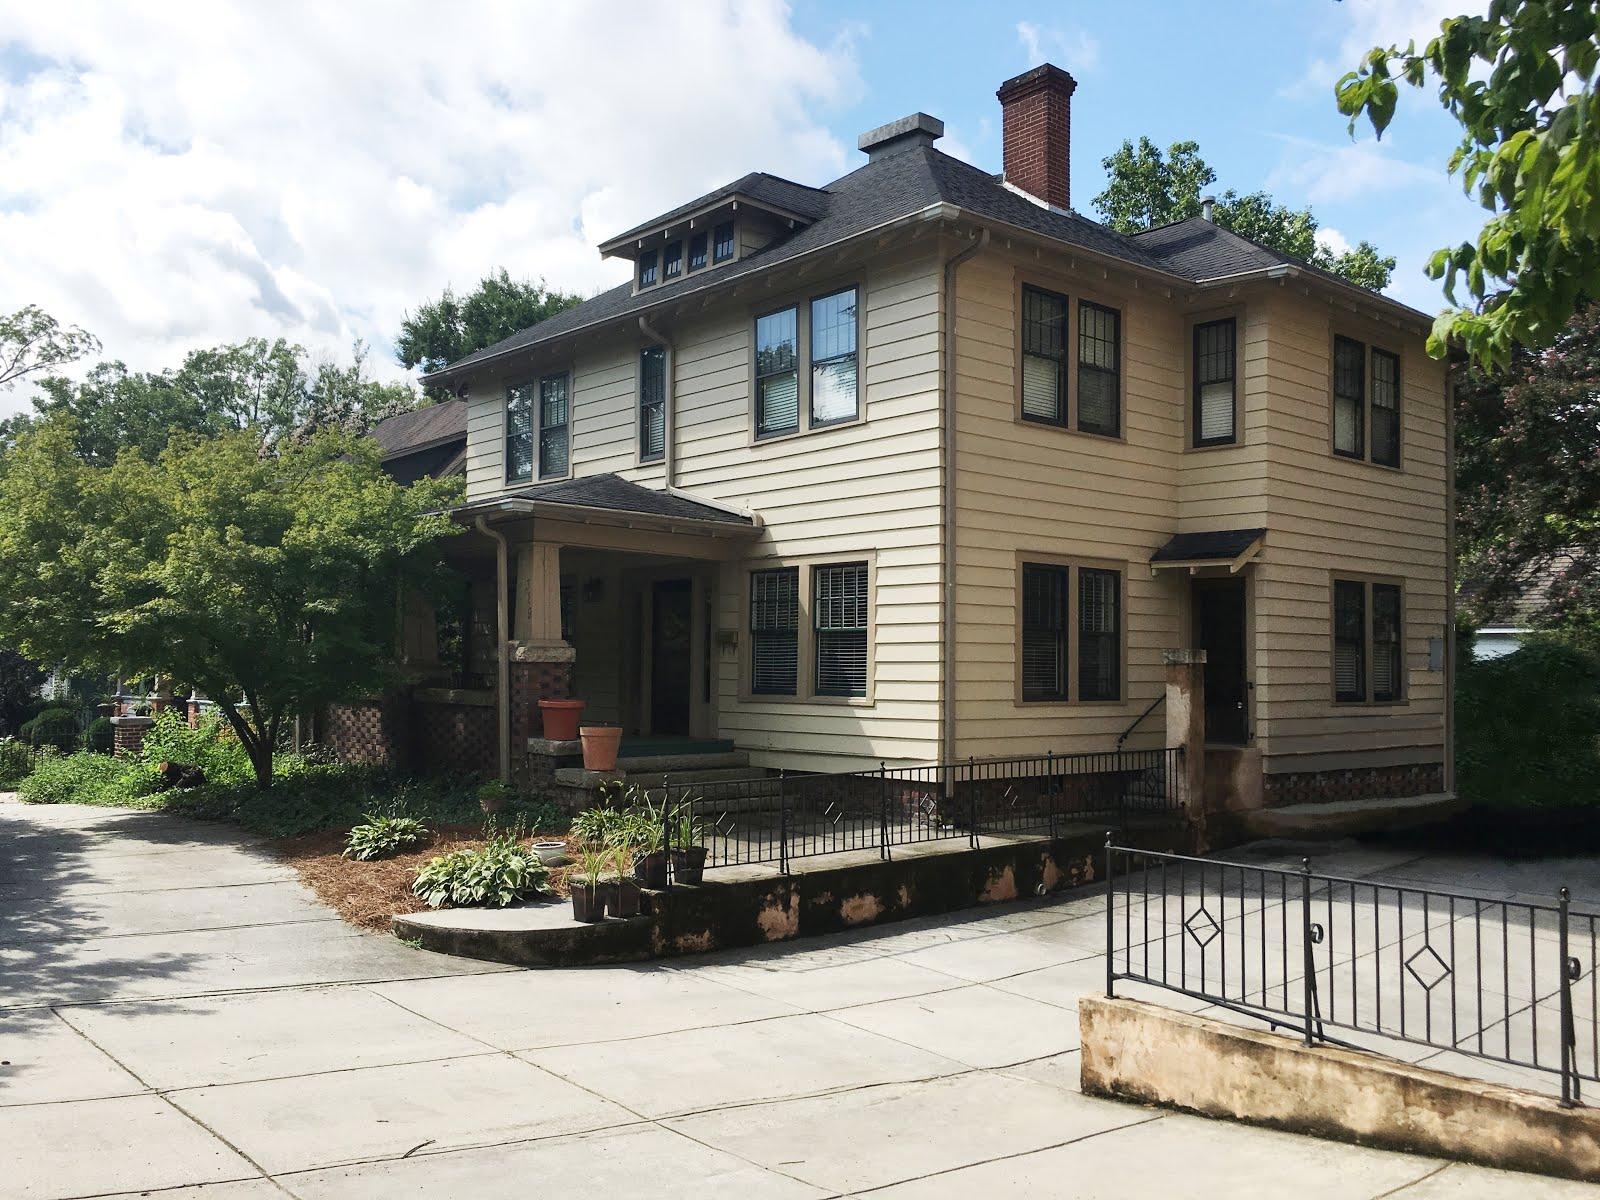 319 W. Horah Street, Salisbury NC 28144 ~ circa 1920 ~ $219,000